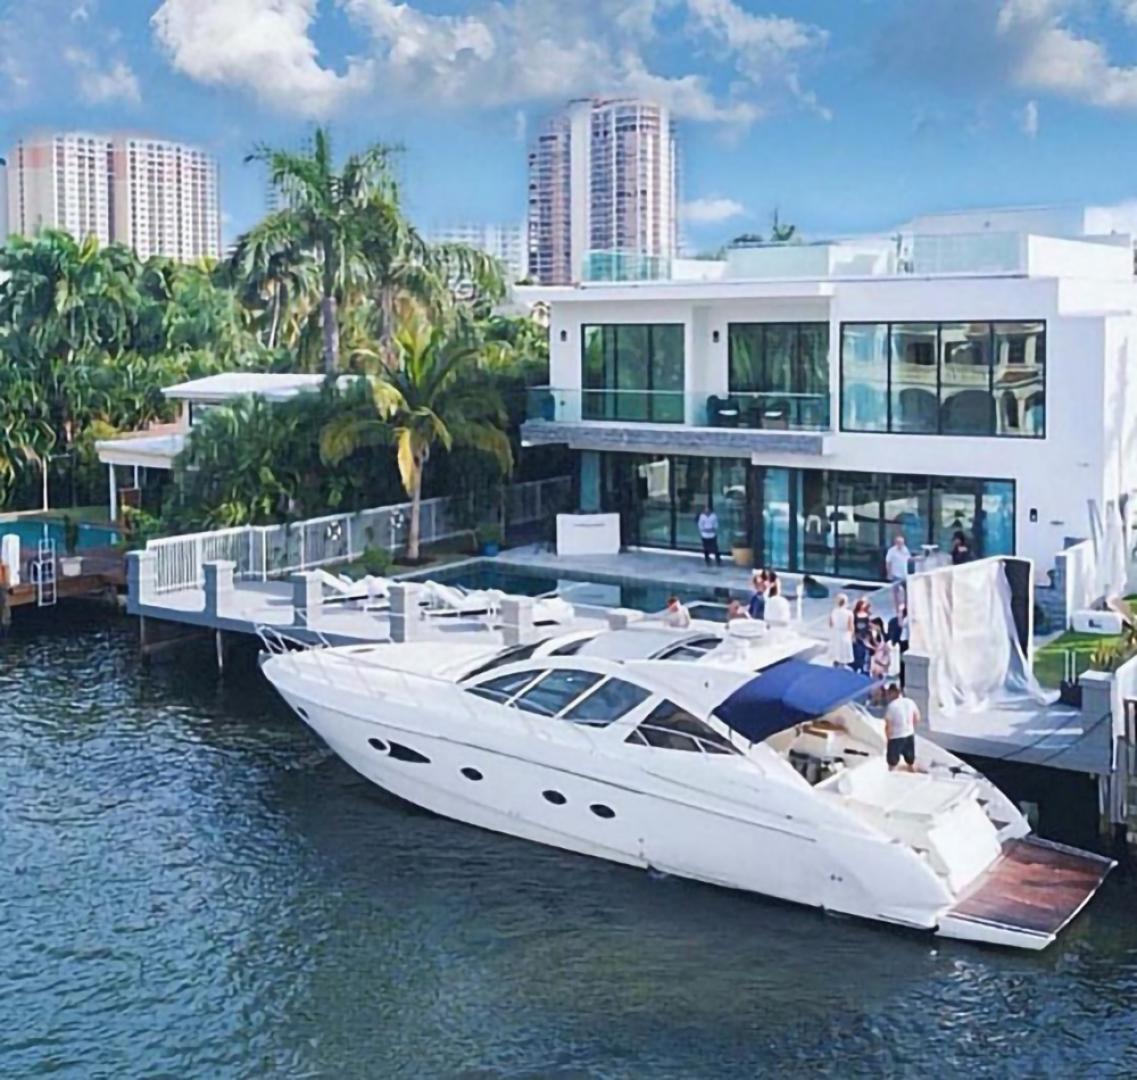 Azimut-Atlantis 54 2010-Sol Miami-Florida-United States-1627968 | Thumbnail